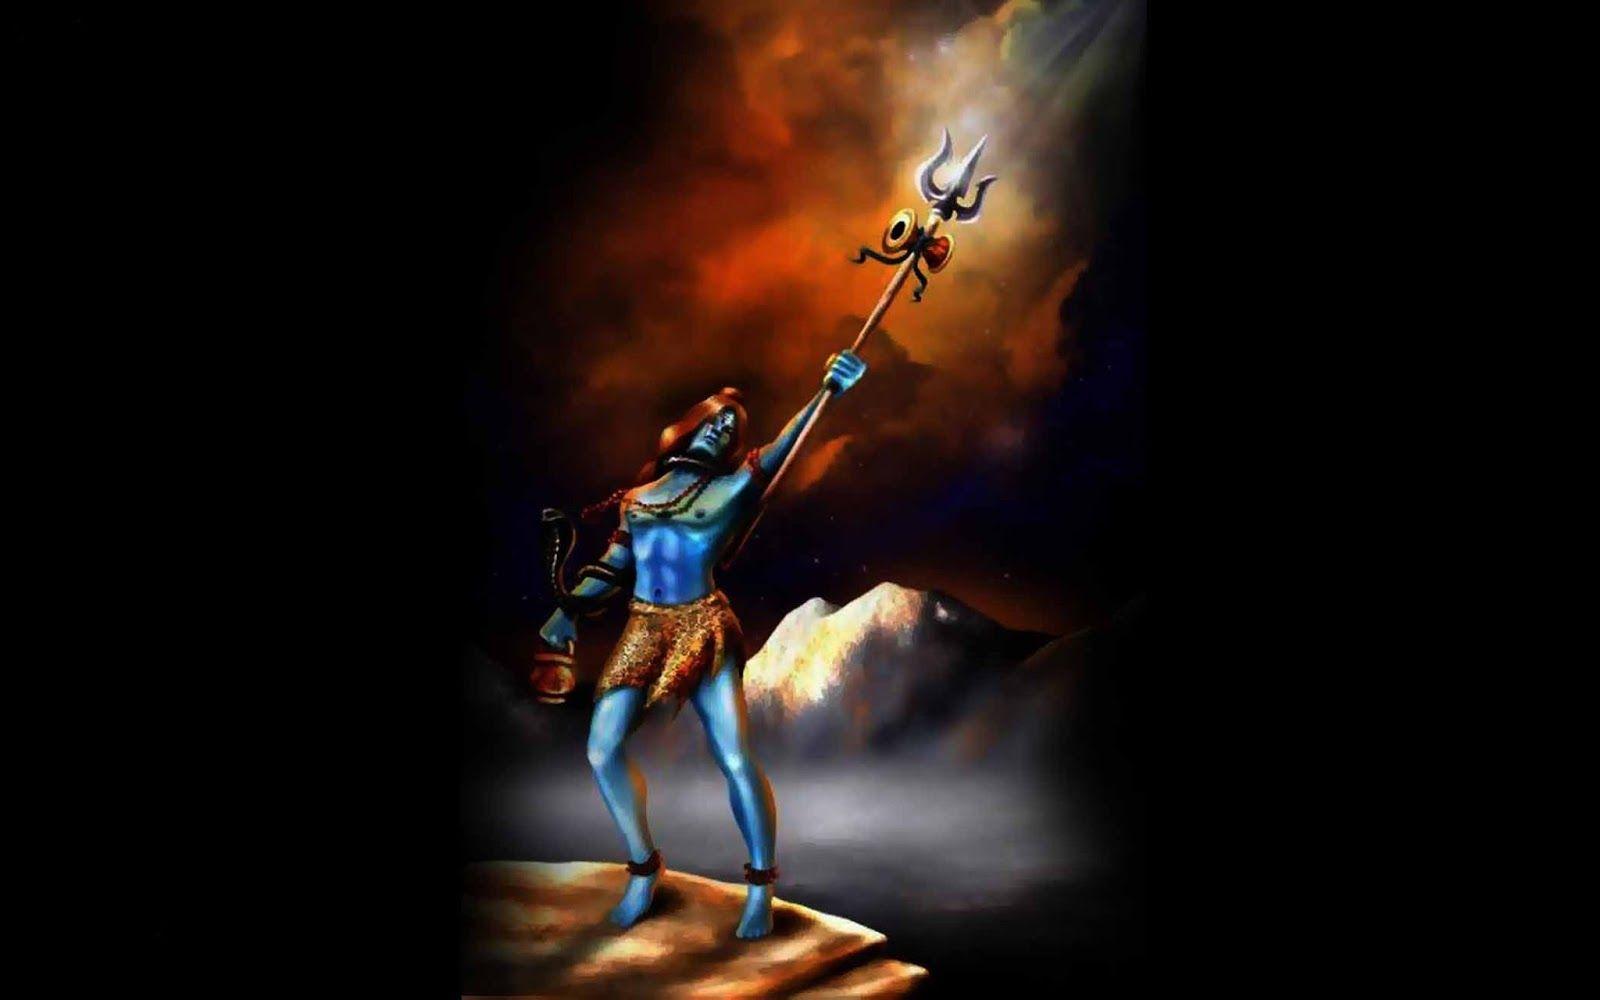 Bholenath Hd 1080p Google Search Lord Shiva Hd Wallpaper 4k Wallpaper For Mobile Hd Wallpapers For Mobile 3d animation ultra hd 1080p shiva hd